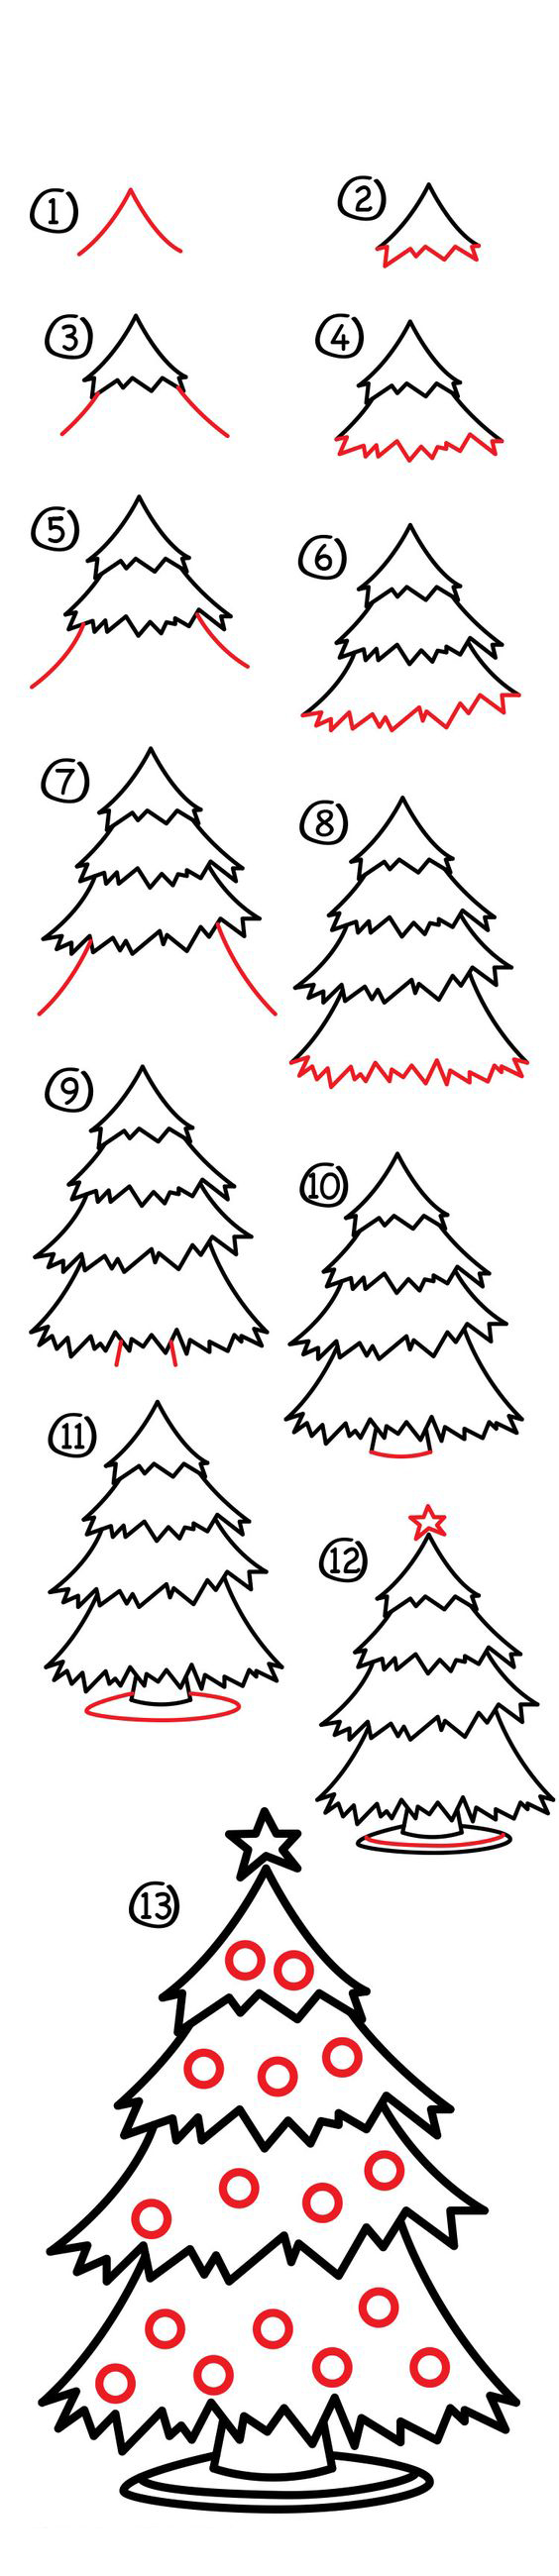 رسم شجرة بابا نويل